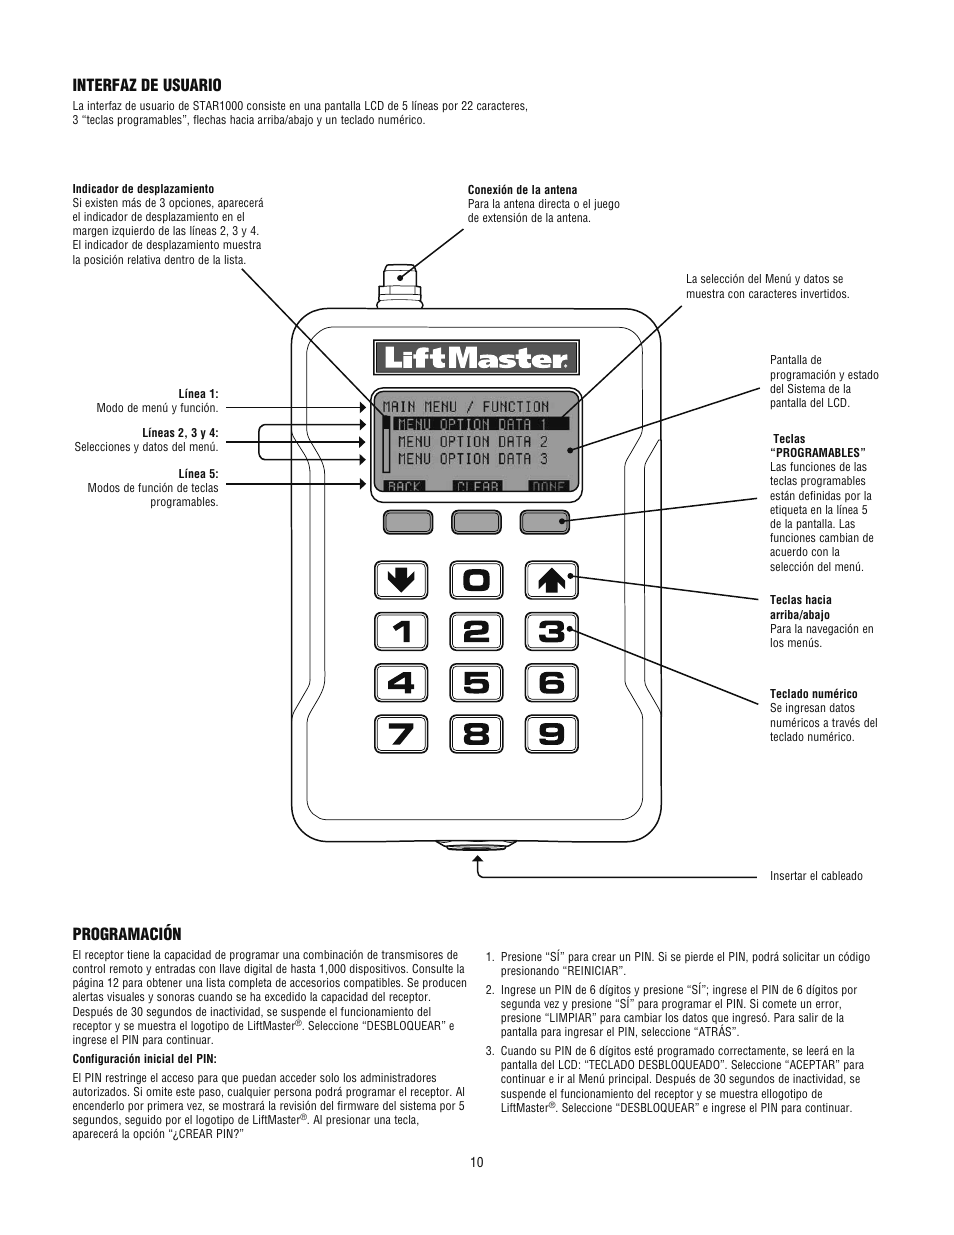 Lift Master Control Diagram - Block And Schematic Diagrams •